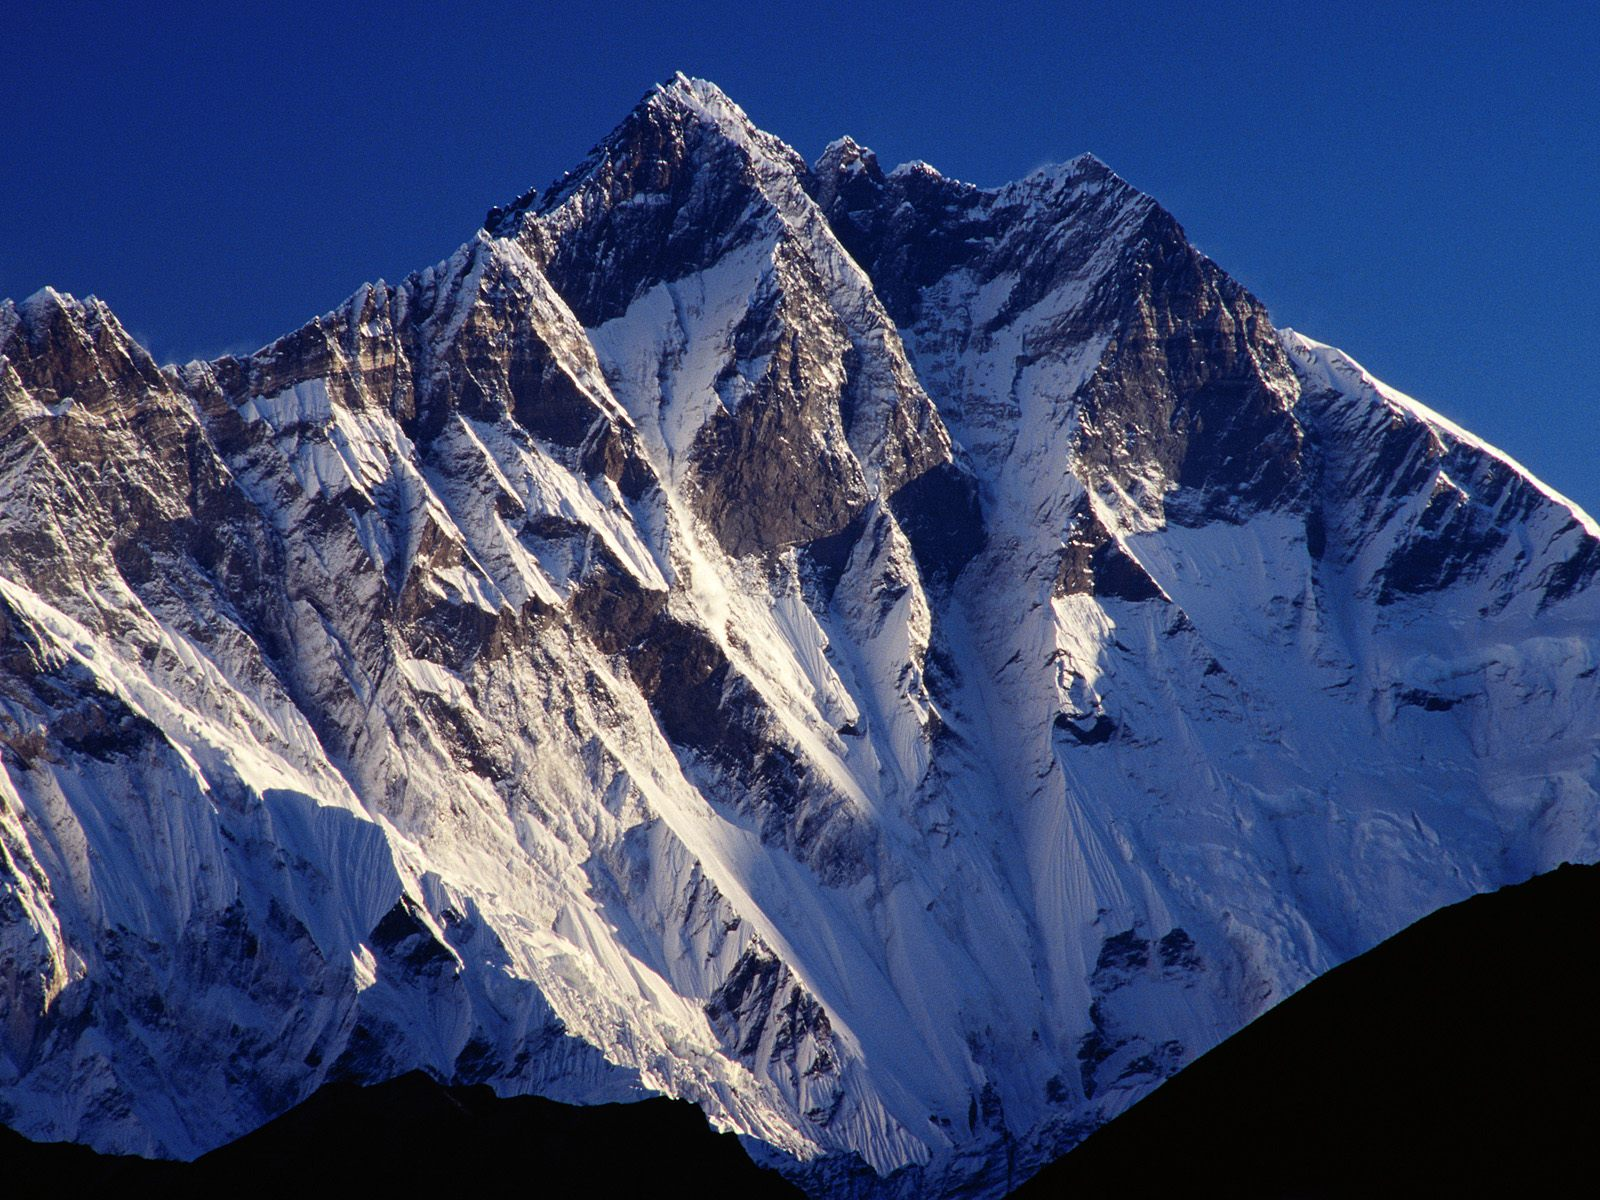 [The+Peak+of+Mount+Lhotse,+Tengpoche,+Sagarmatha,+Nepal.jpg]